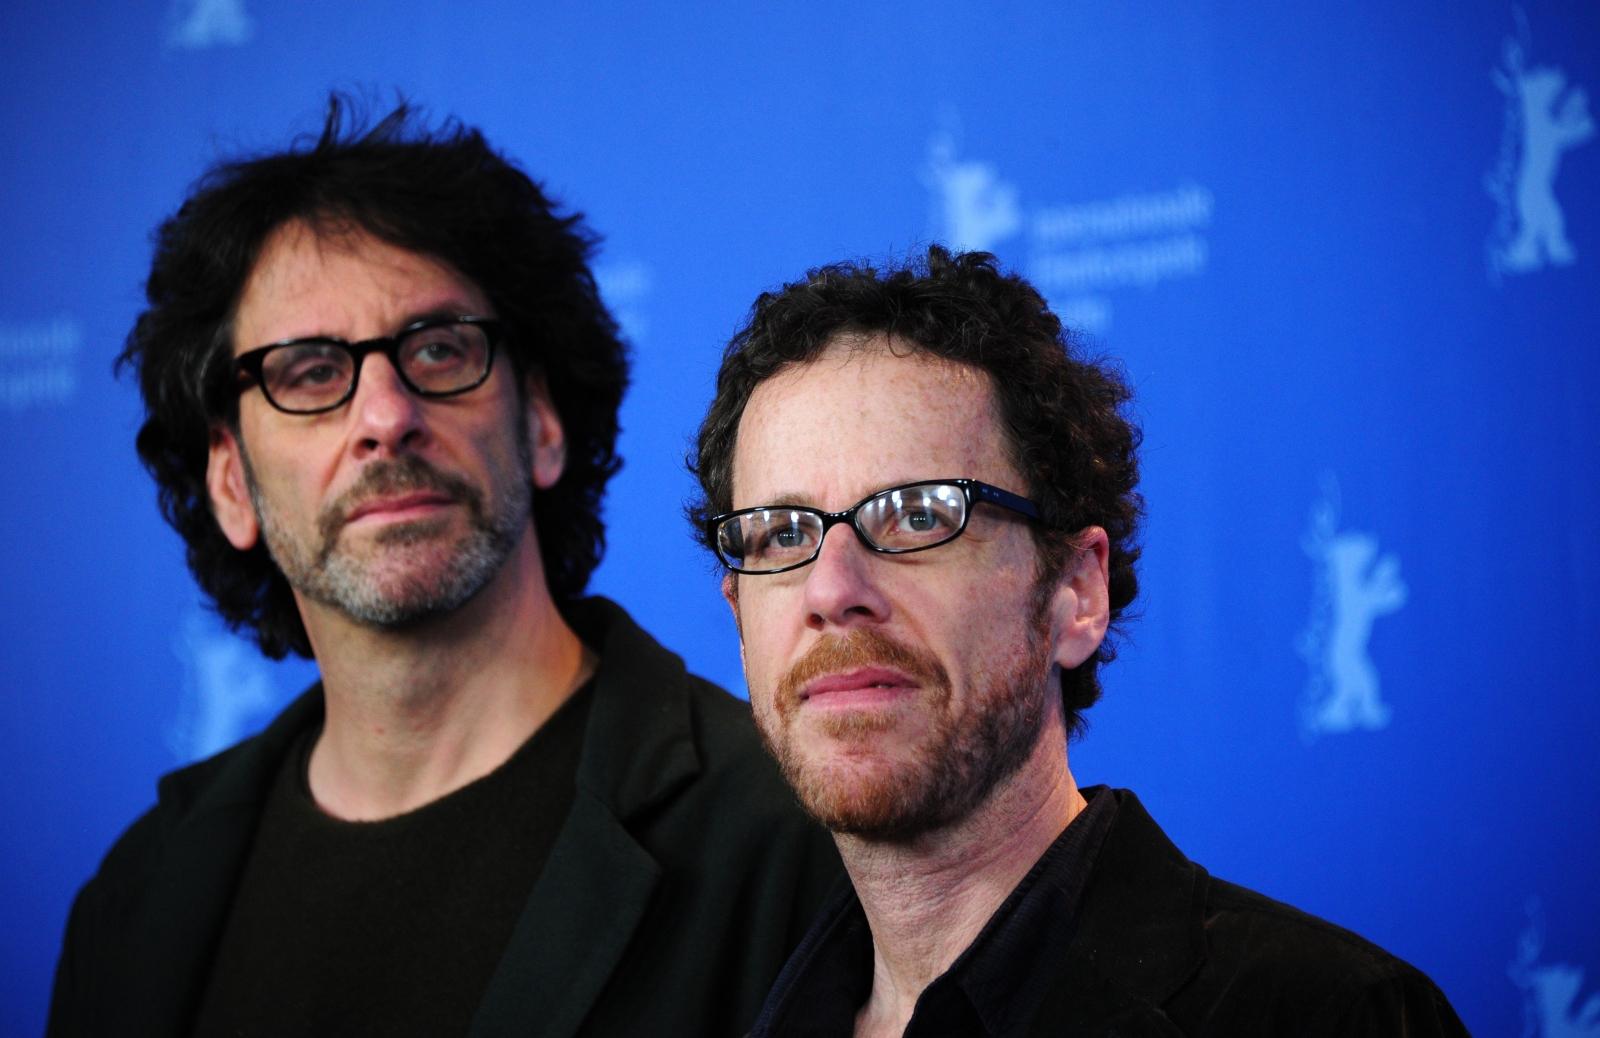 Joel Coen and Ethan Coen